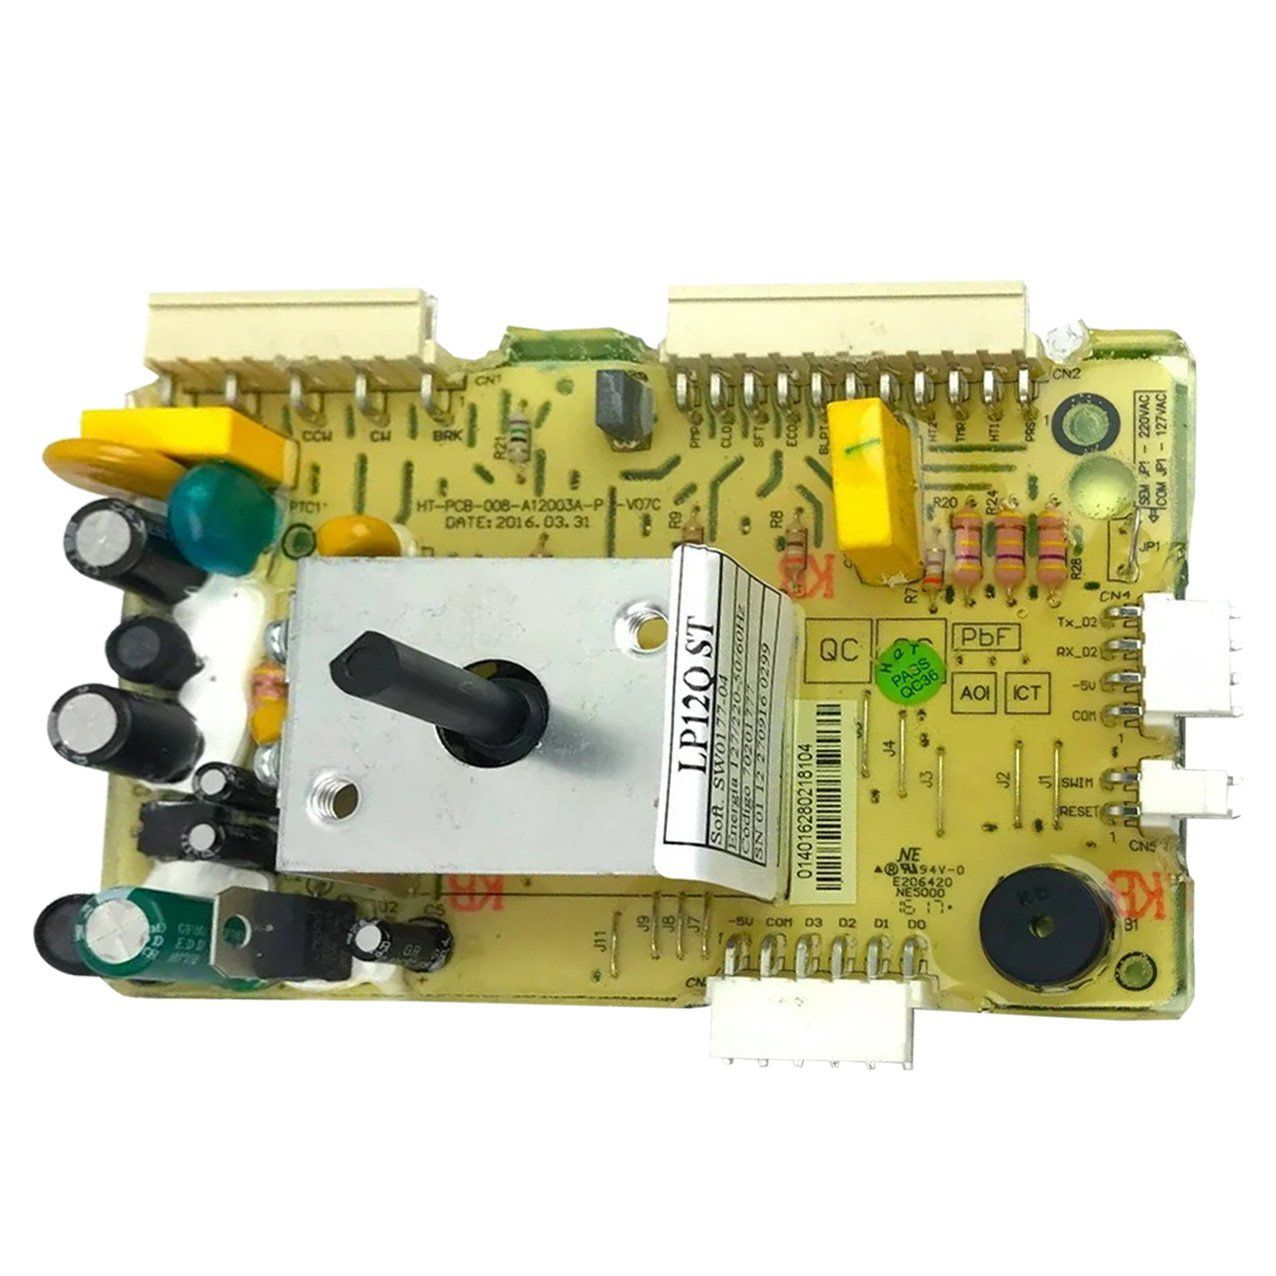 Placa De Potência Lavadora Electrolux Lp12Q - 70201777